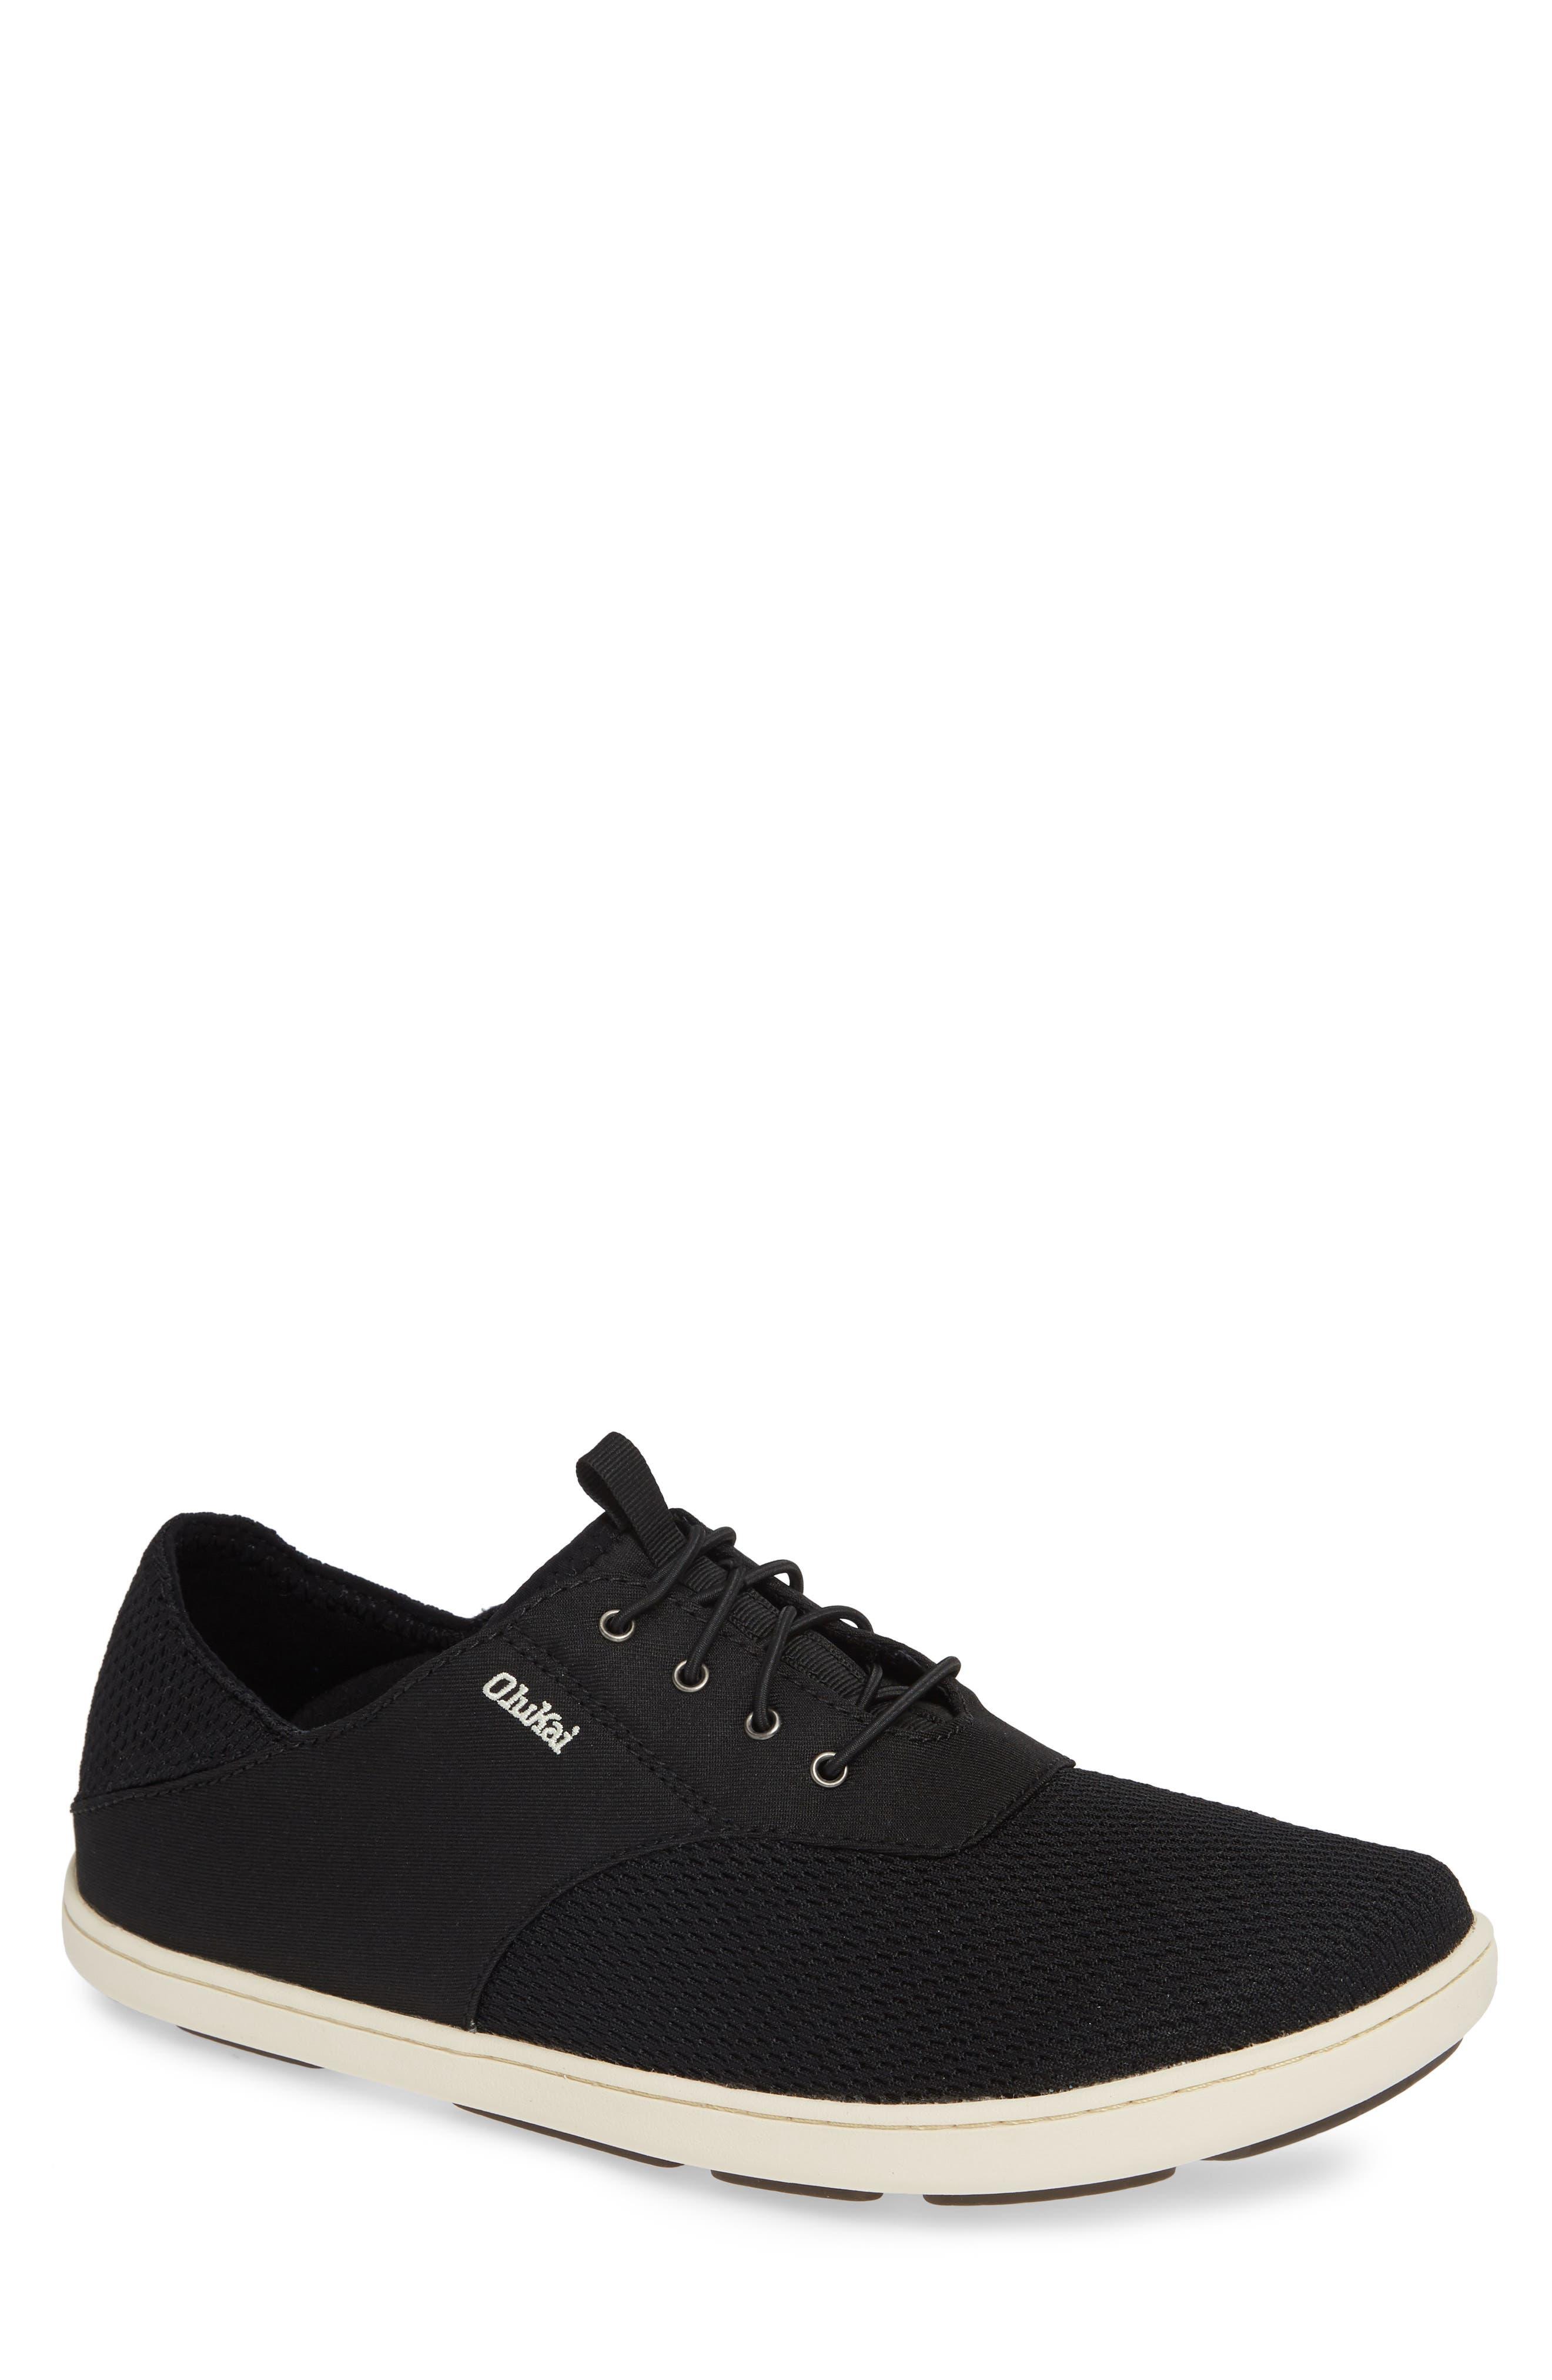 Nohea Moku Sneaker,                         Main,                         color, ONYX/ ONYX TEXTILE